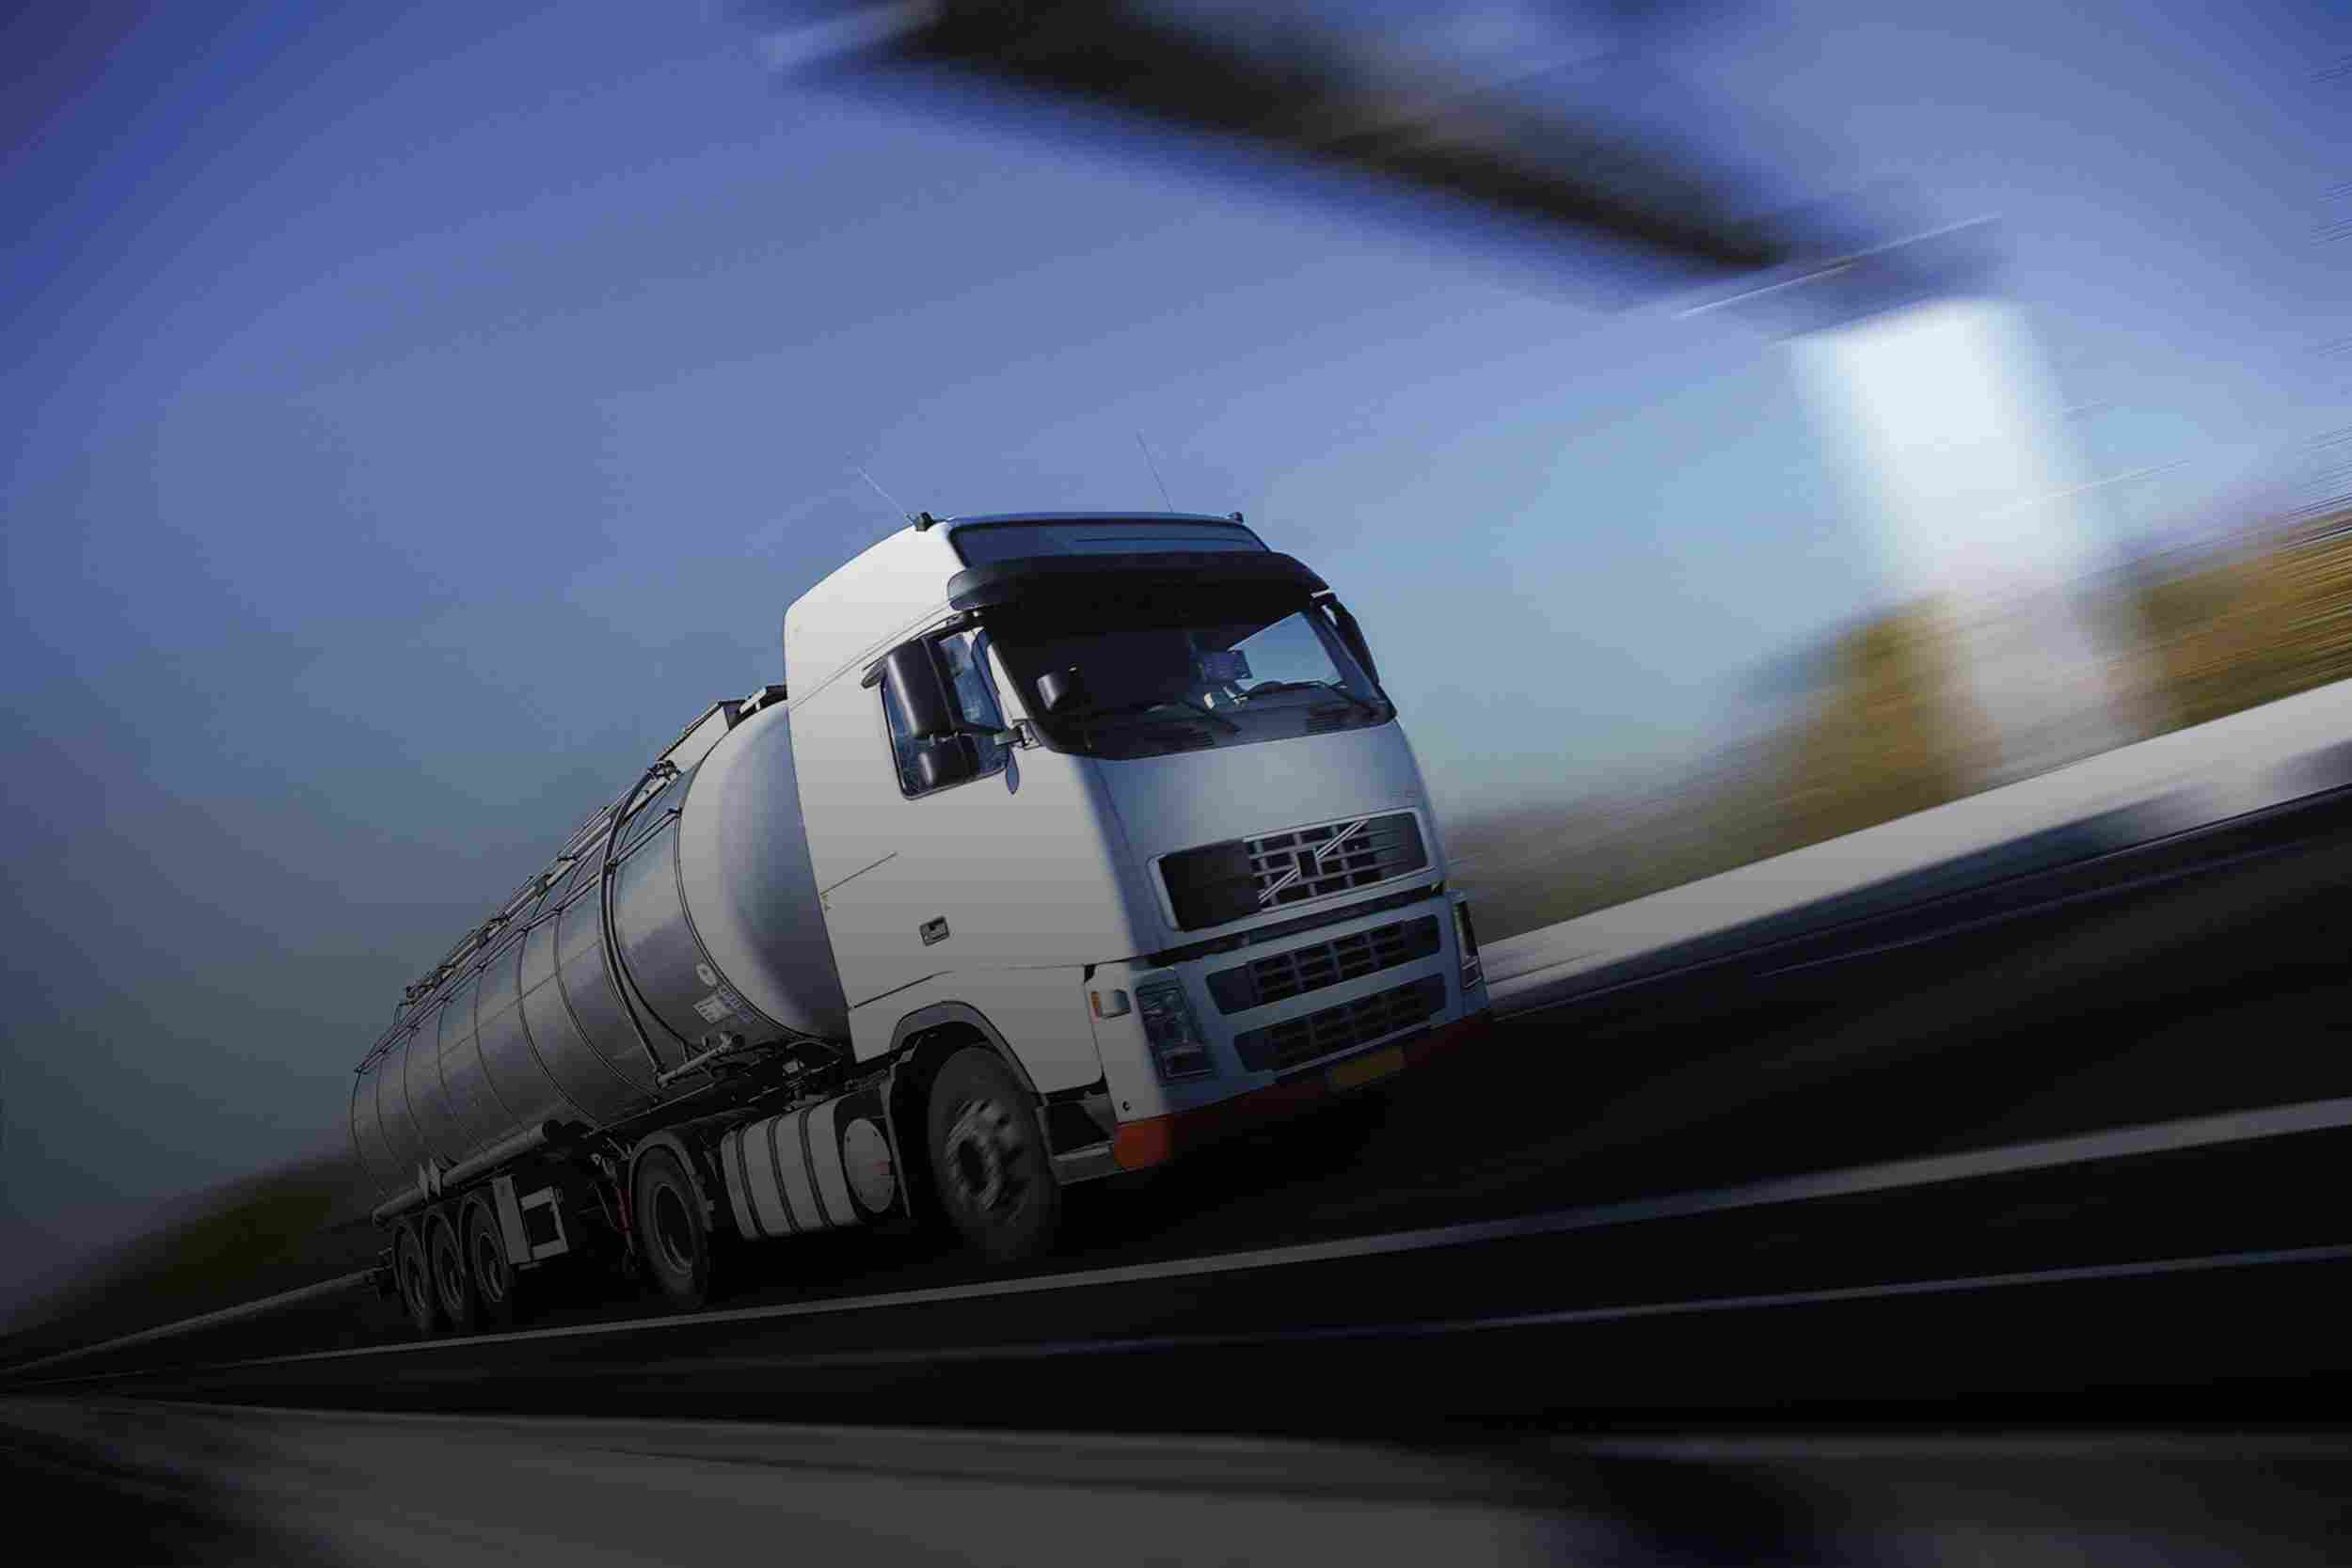 http://www.aerodarat.com/wp-content/uploads/2015/09/White-Truck-single.jpg